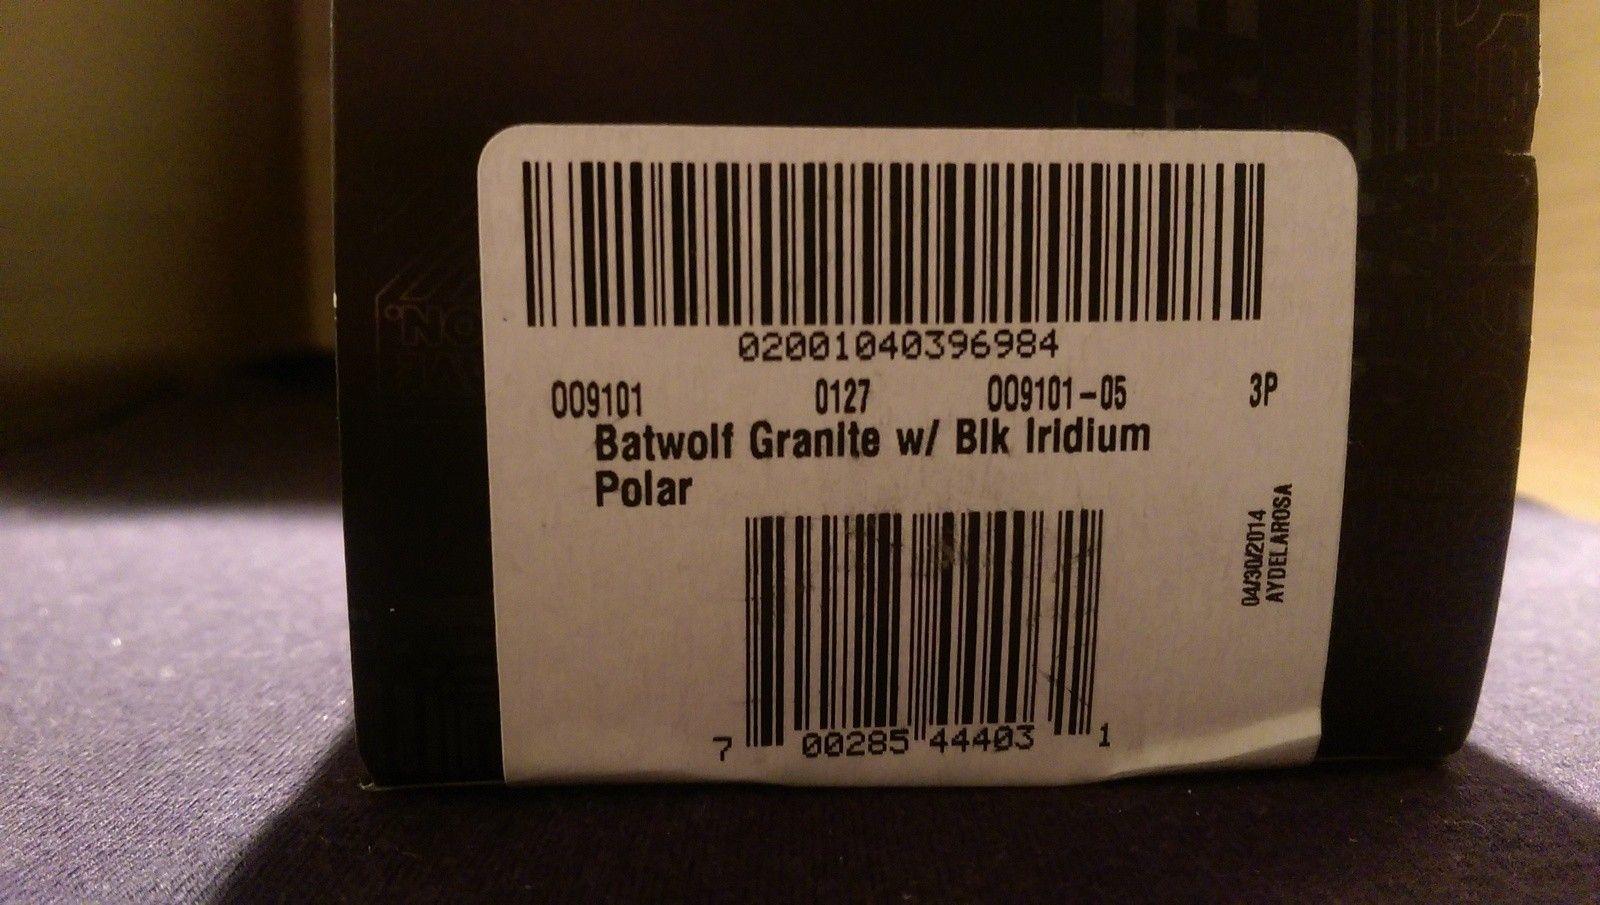 BNIB Batwolfs various sku ***Price drop*** - uploadfromtaptalk1453322685676.jpg